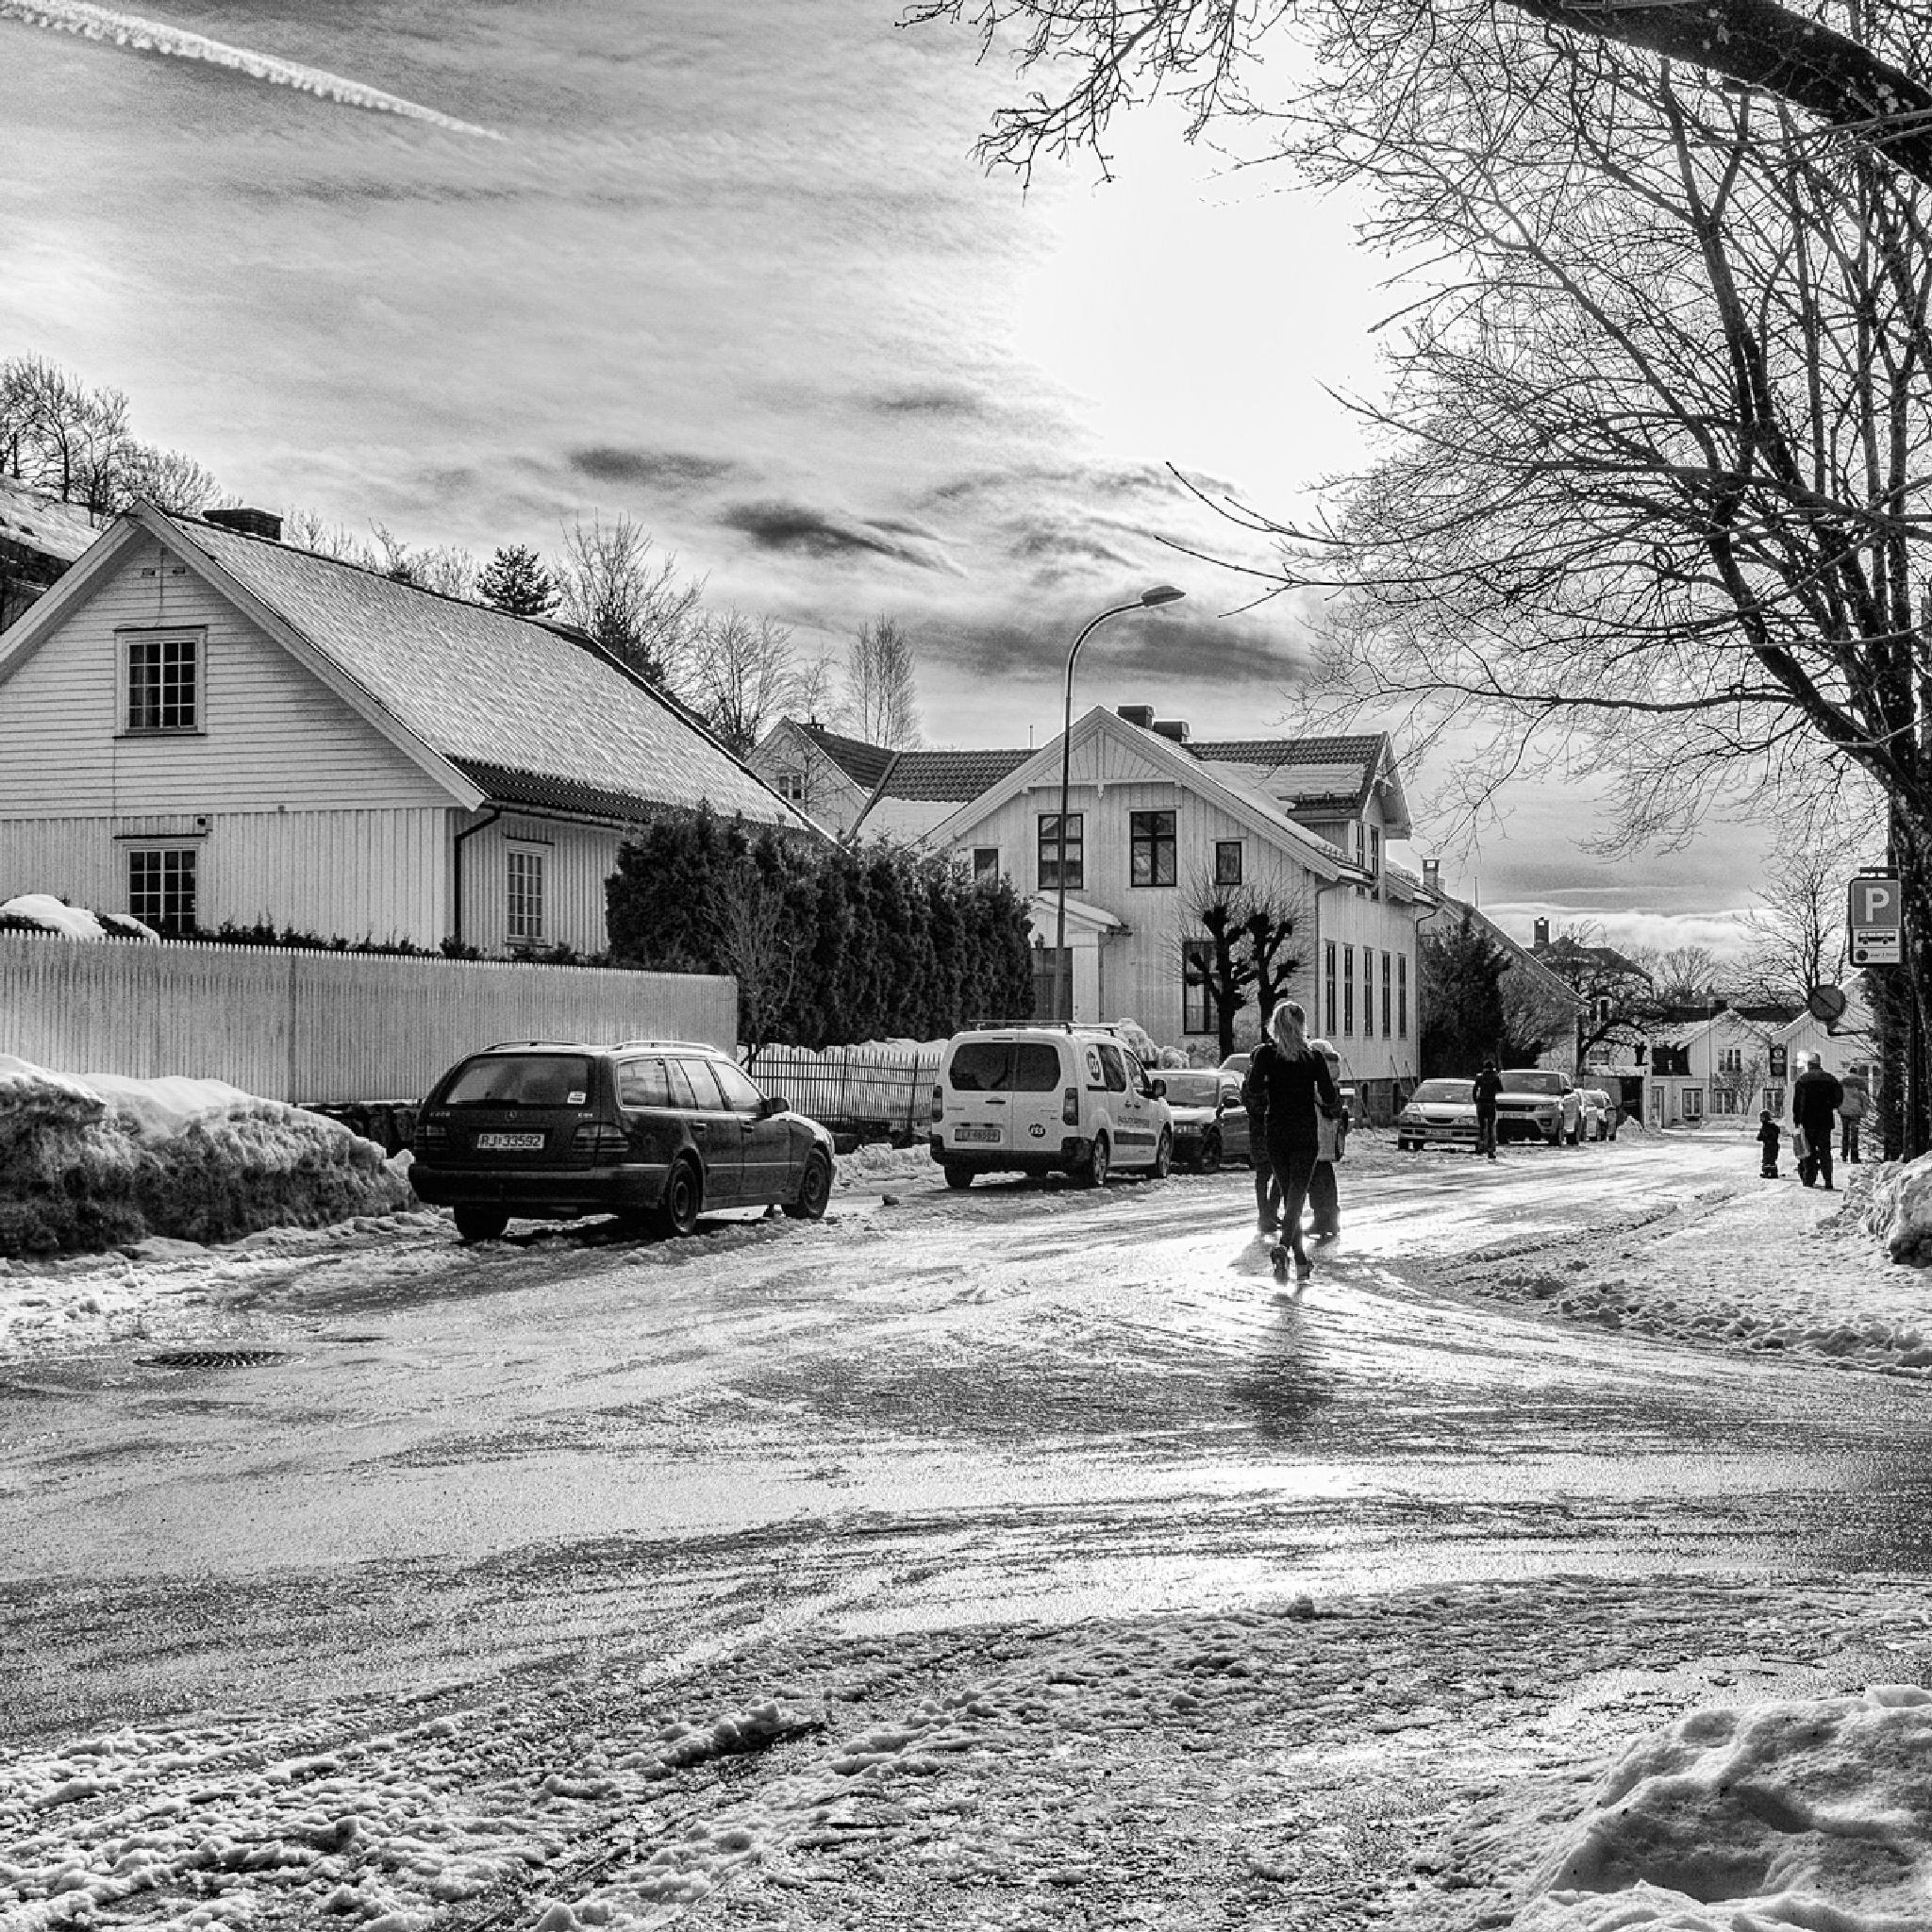 Winter by Frank Emil Østborg